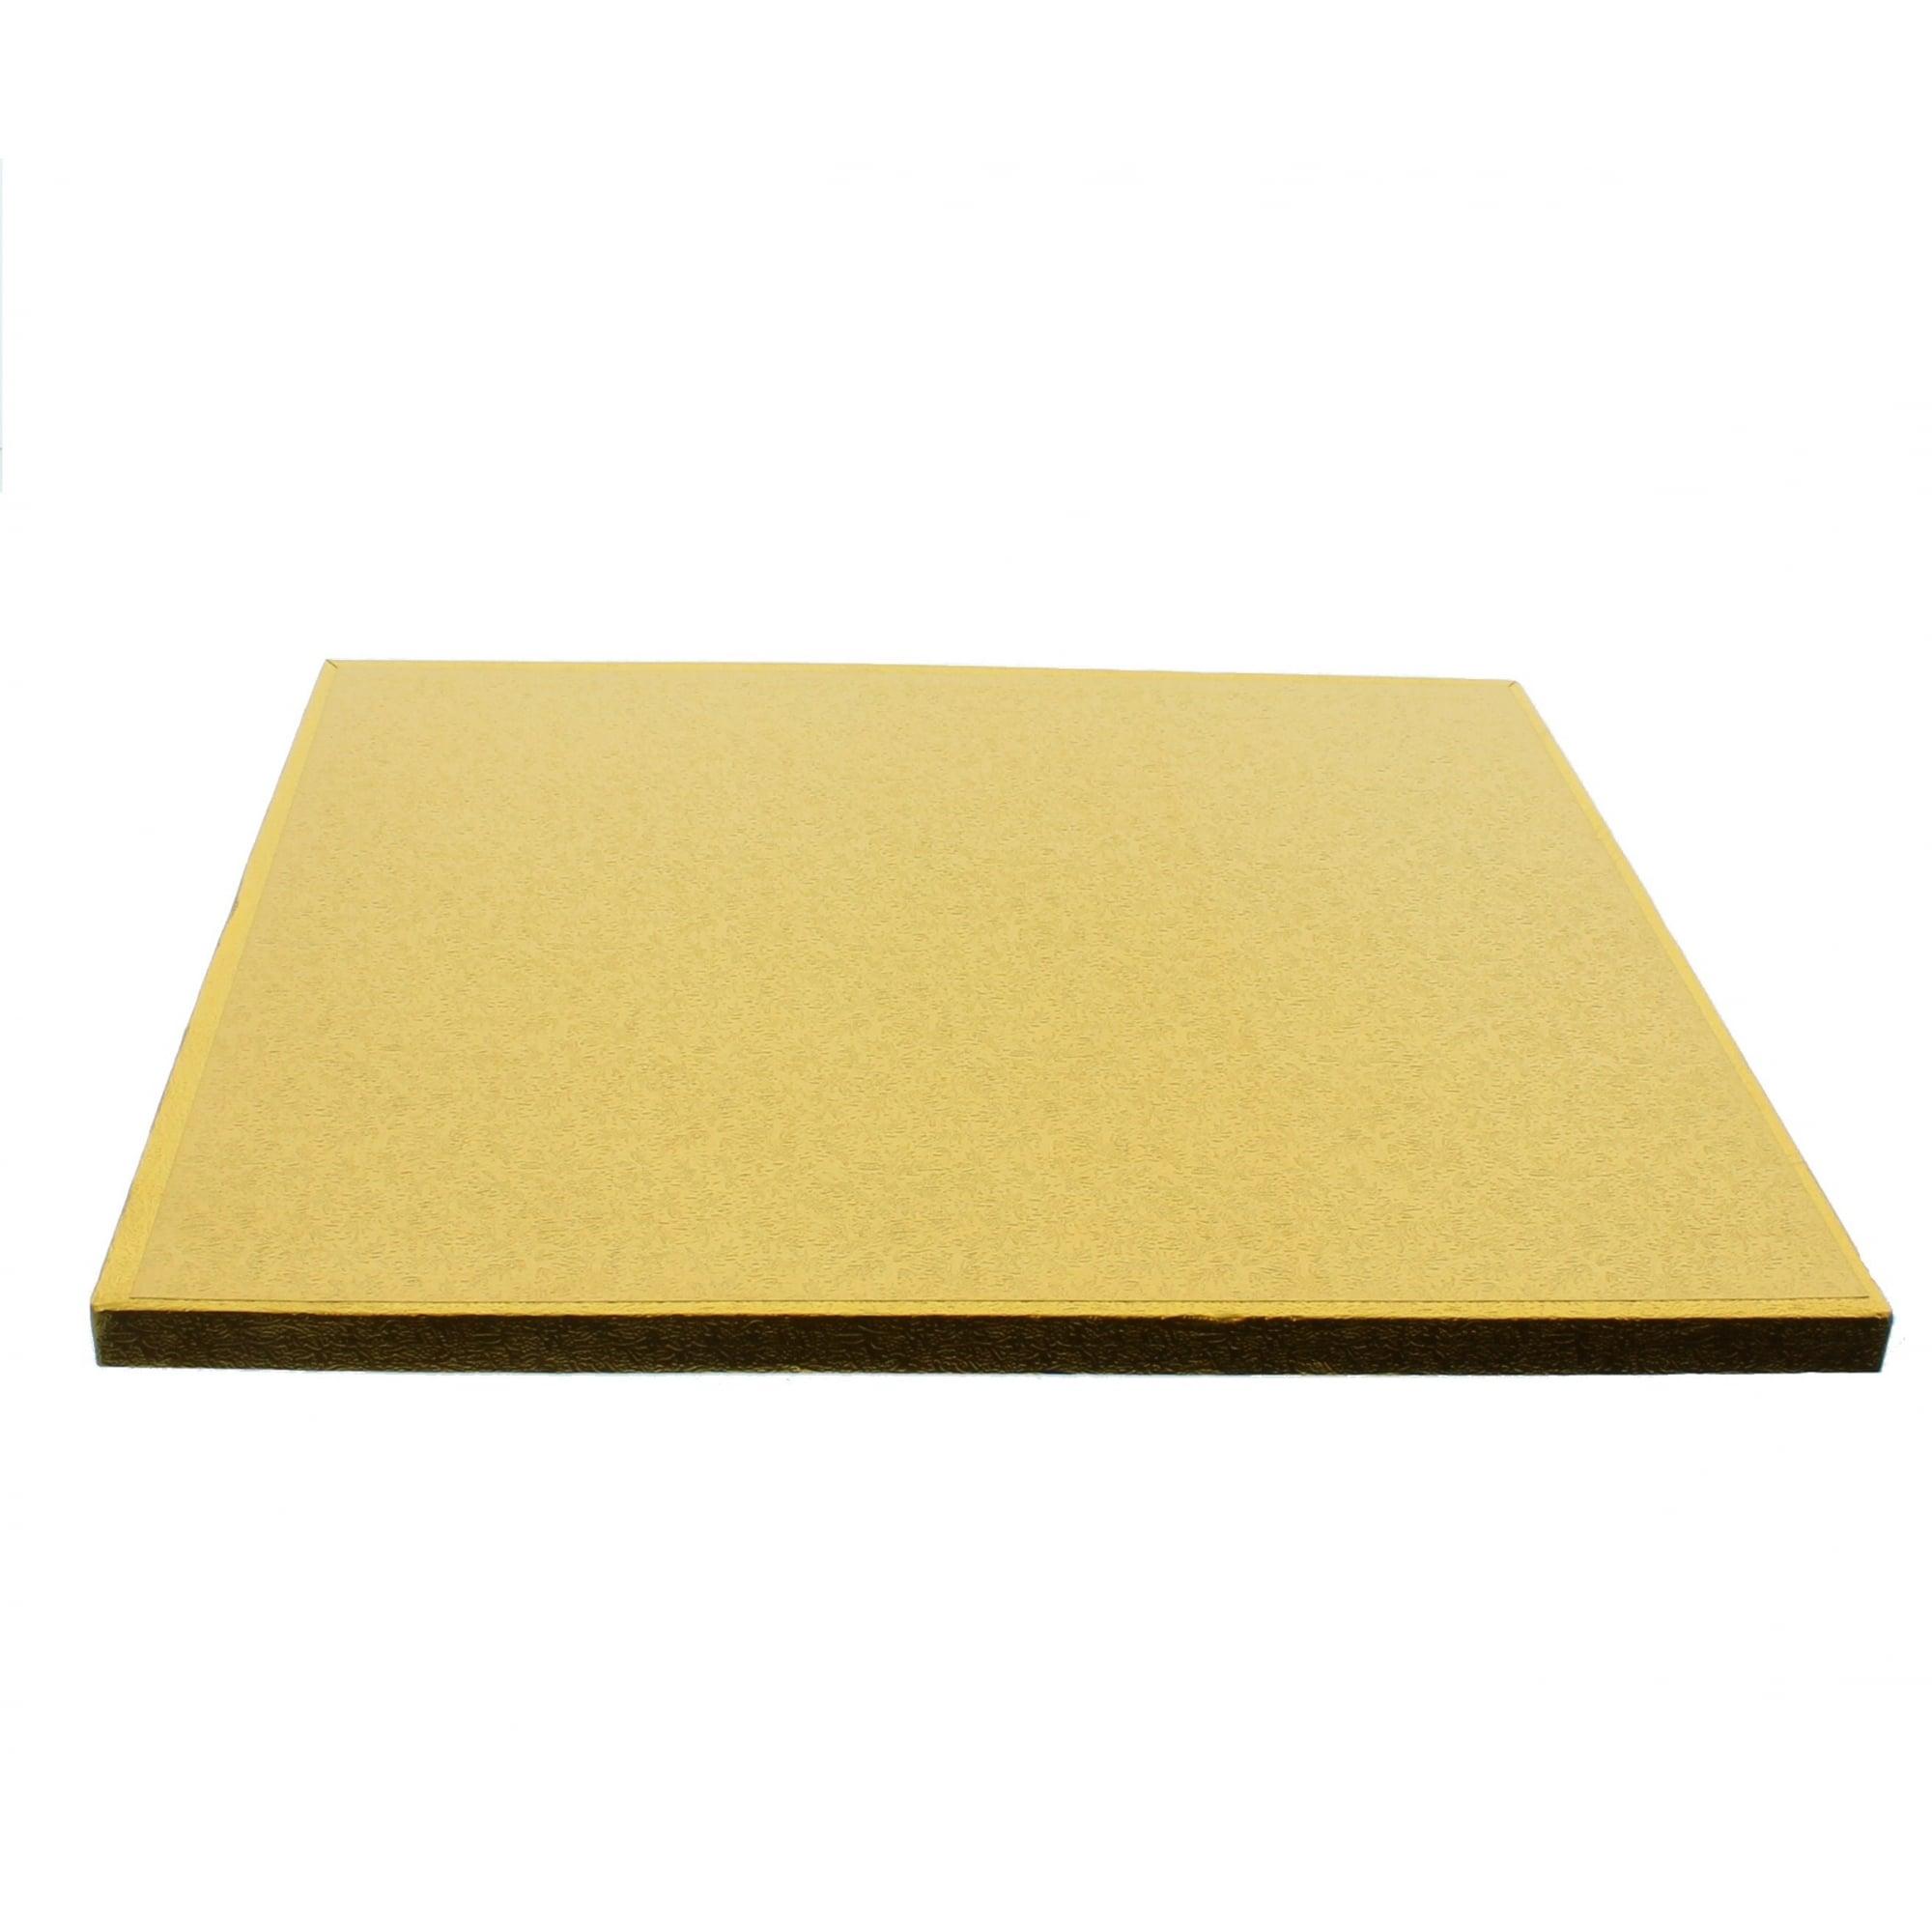 Gold Square 10 inch Cake Drum//Board